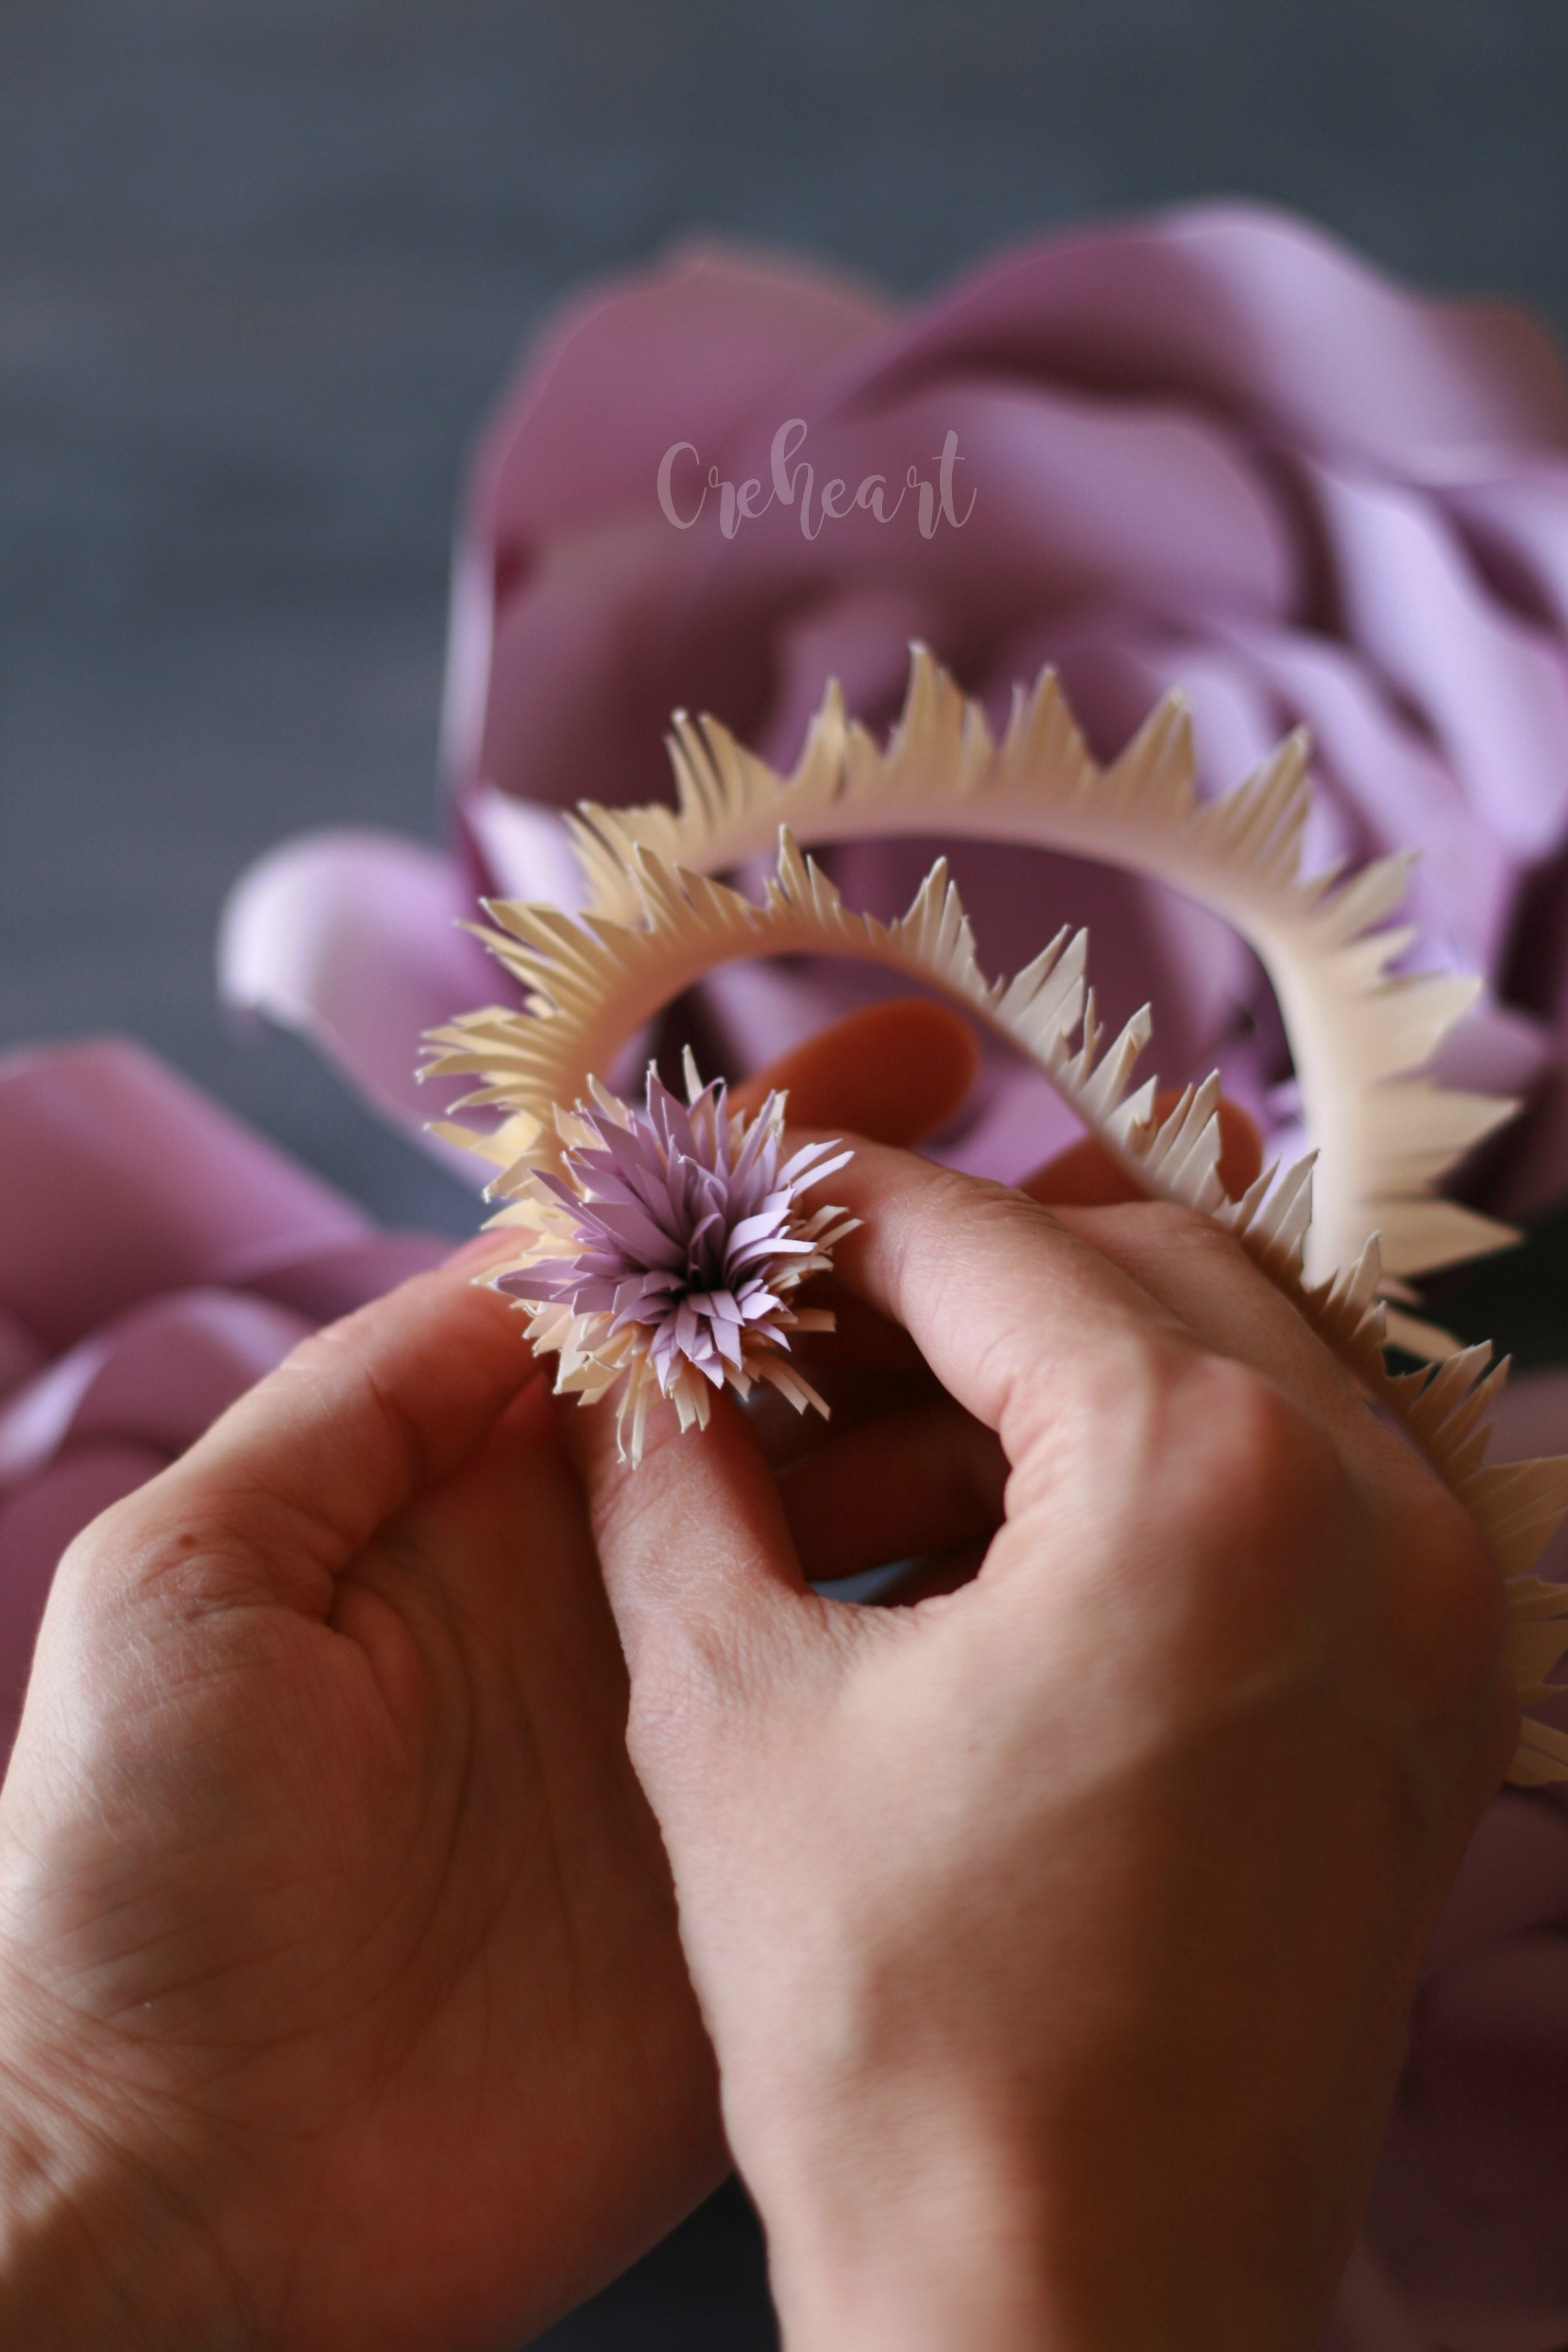 Fiore carciofo.jpg